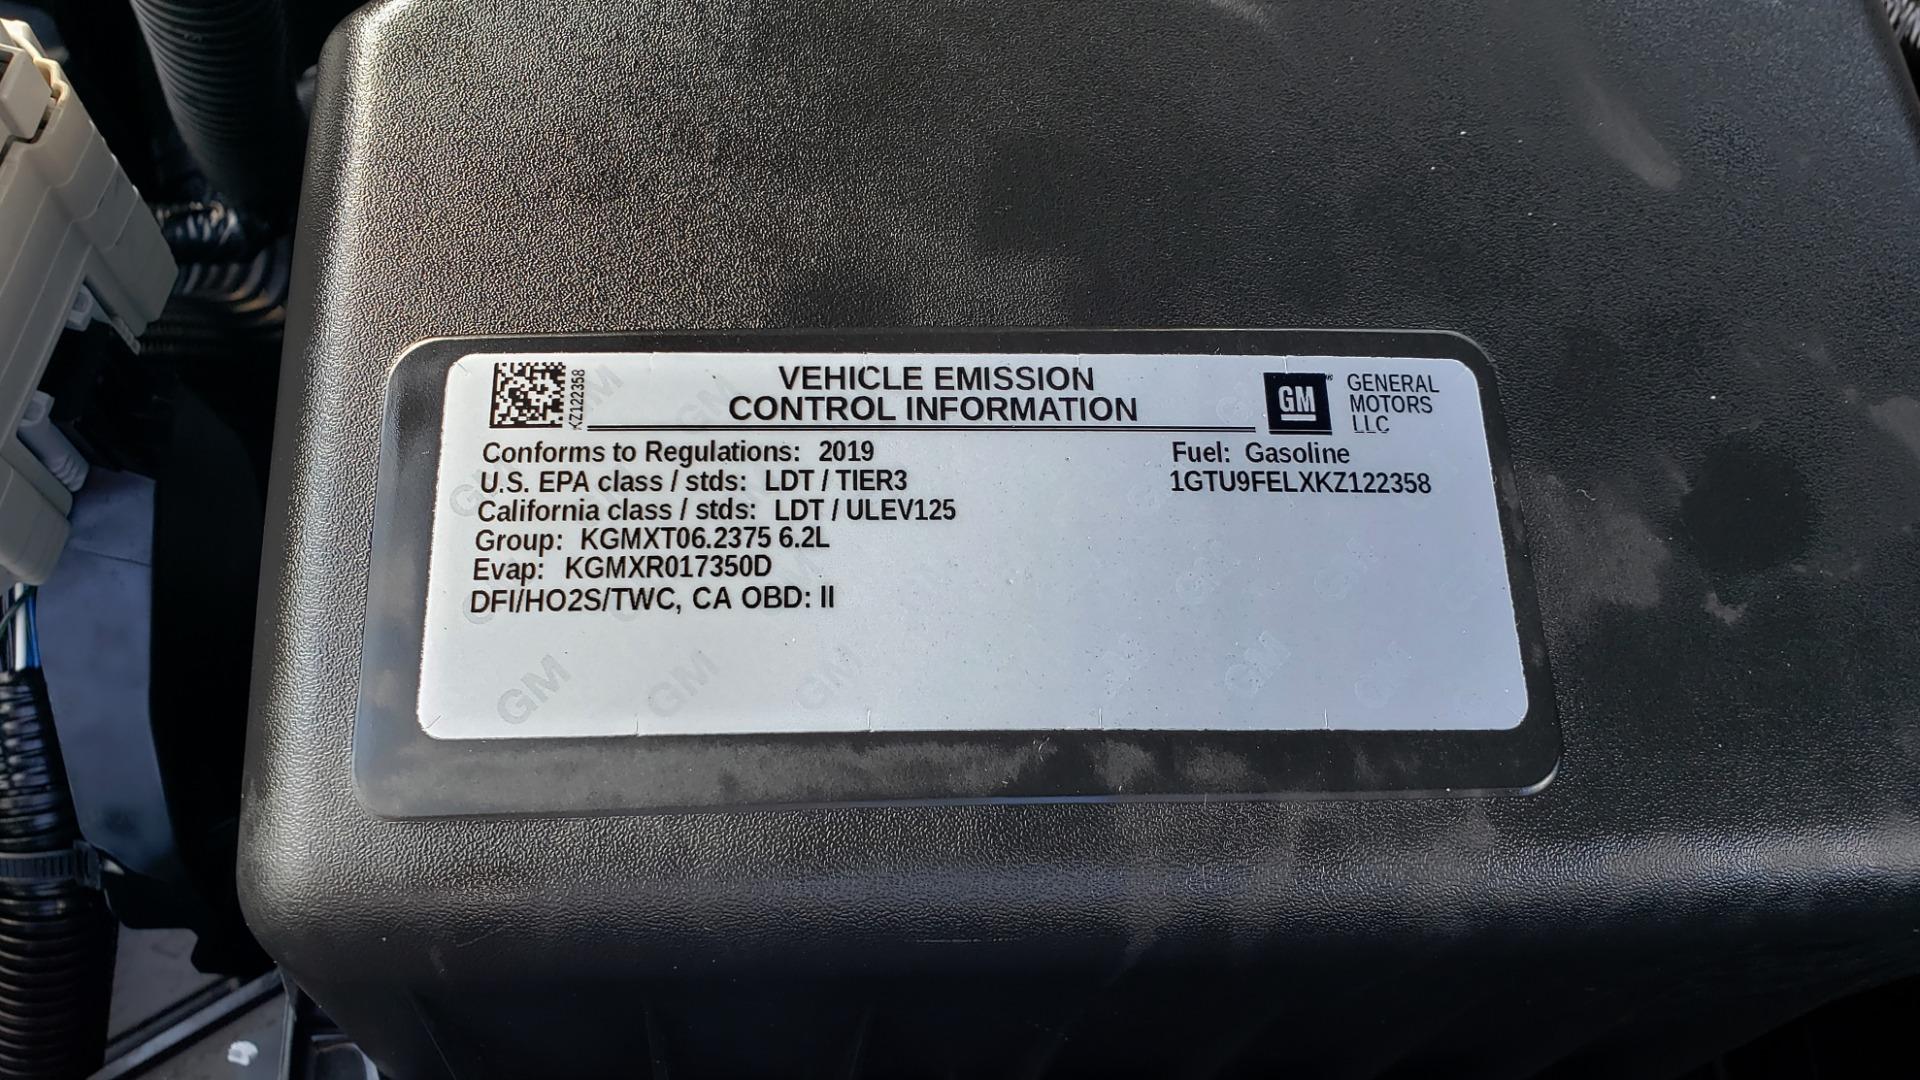 Used 2019 GMC SIERRA 1500 DENALI ULTIMATE 4WD / NAV / TECH PKG / DRVR ALRT for sale Sold at Formula Imports in Charlotte NC 28227 18